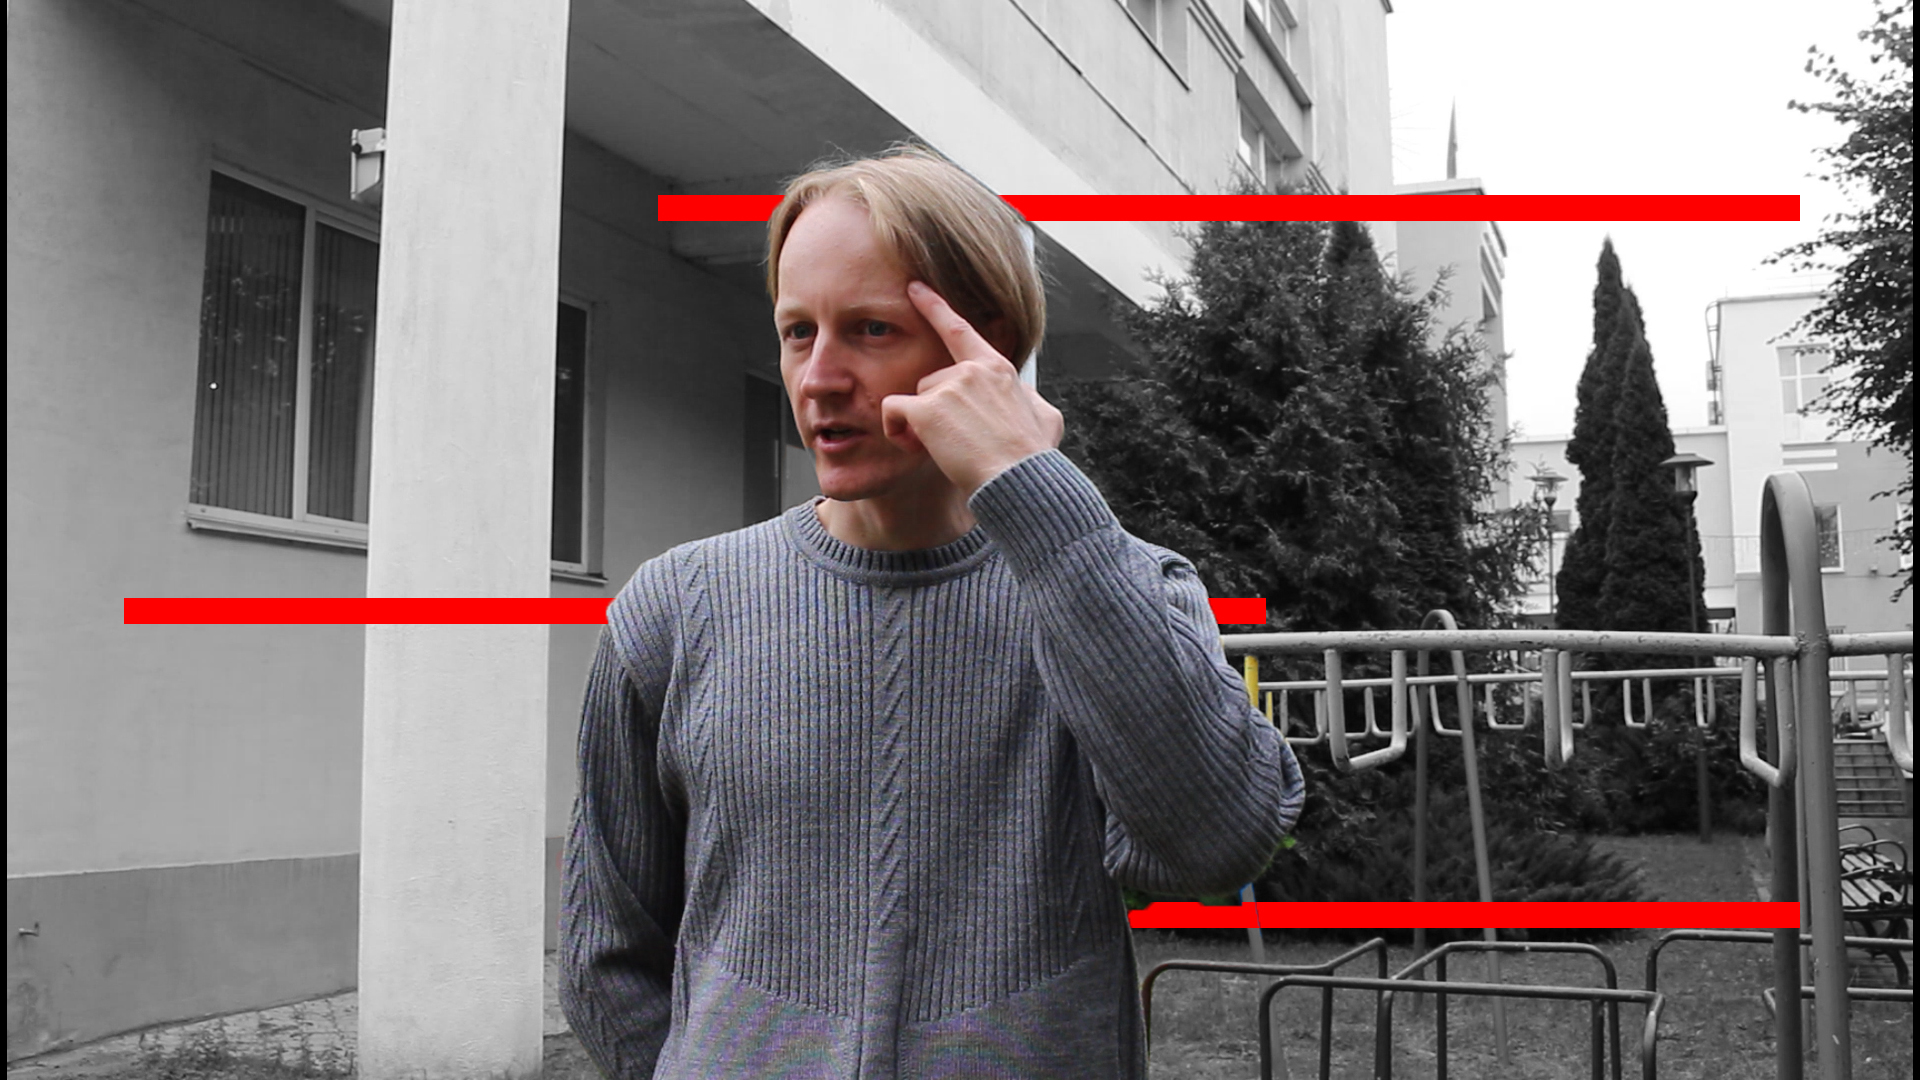 Беларускі калідор катаванняў ВІДЭА